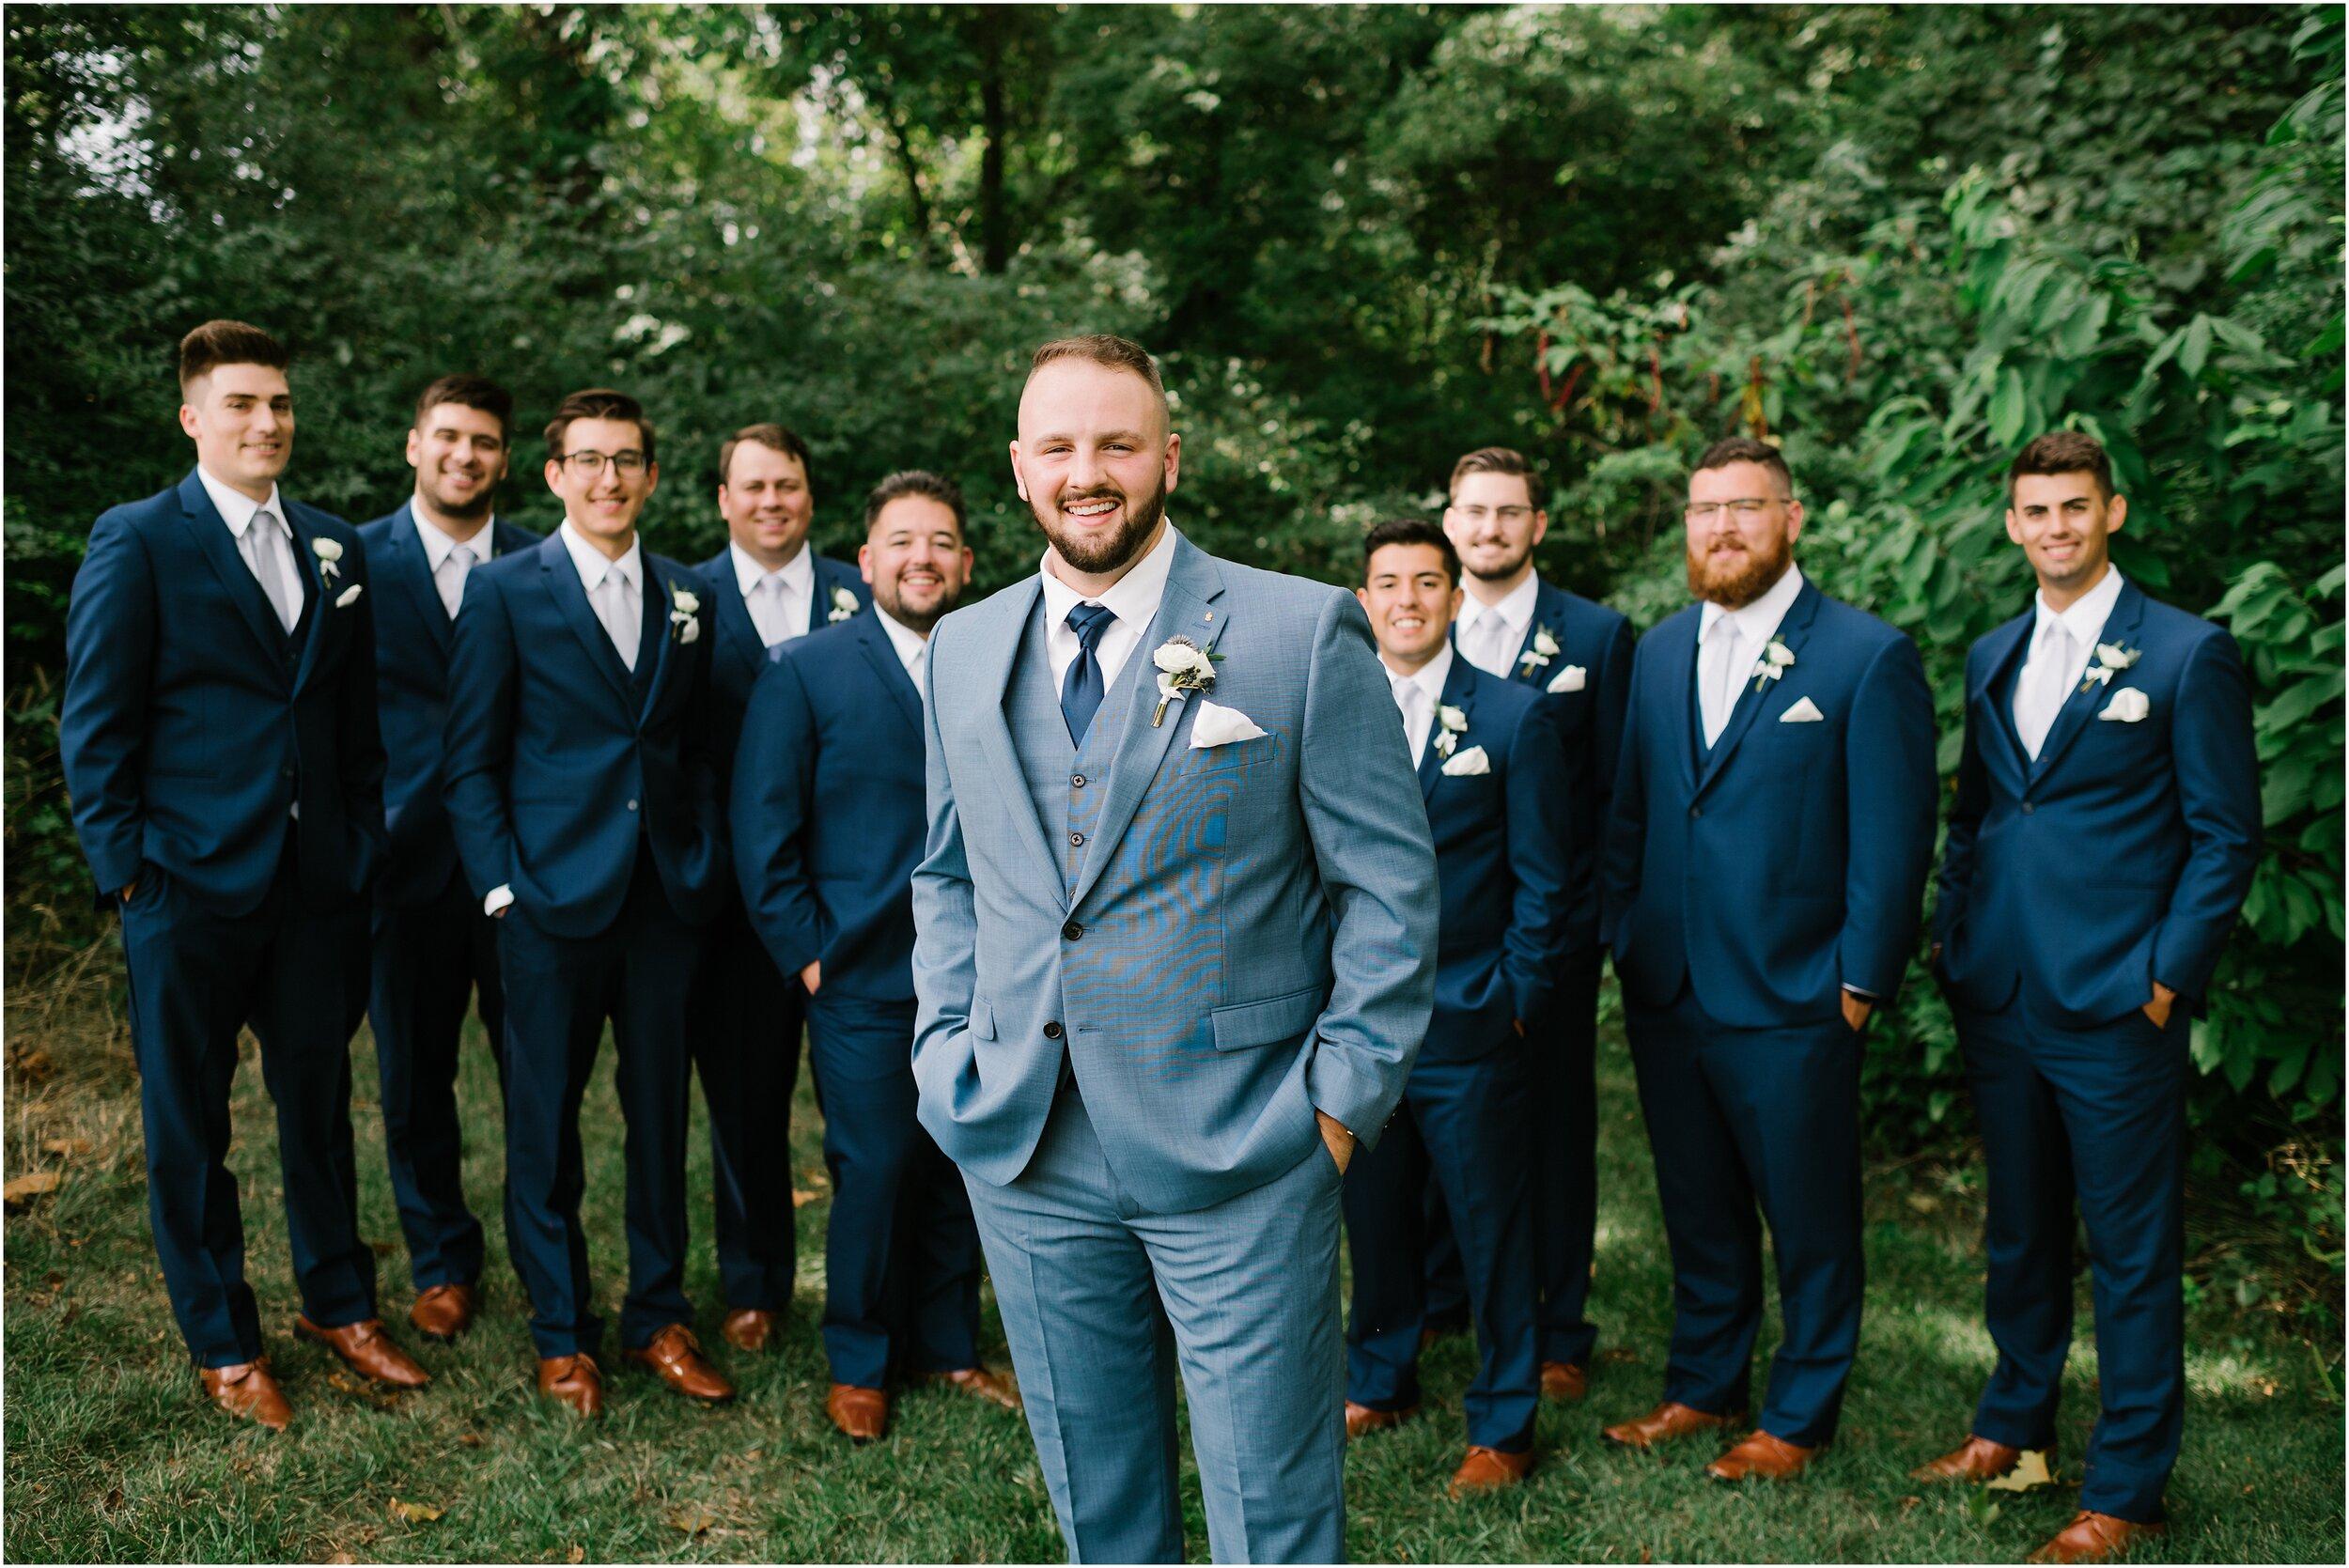 Rebecca Shehorn Photography Indianapolis Wedding Photographer Sycamore at Mallow Run_0728.jpg